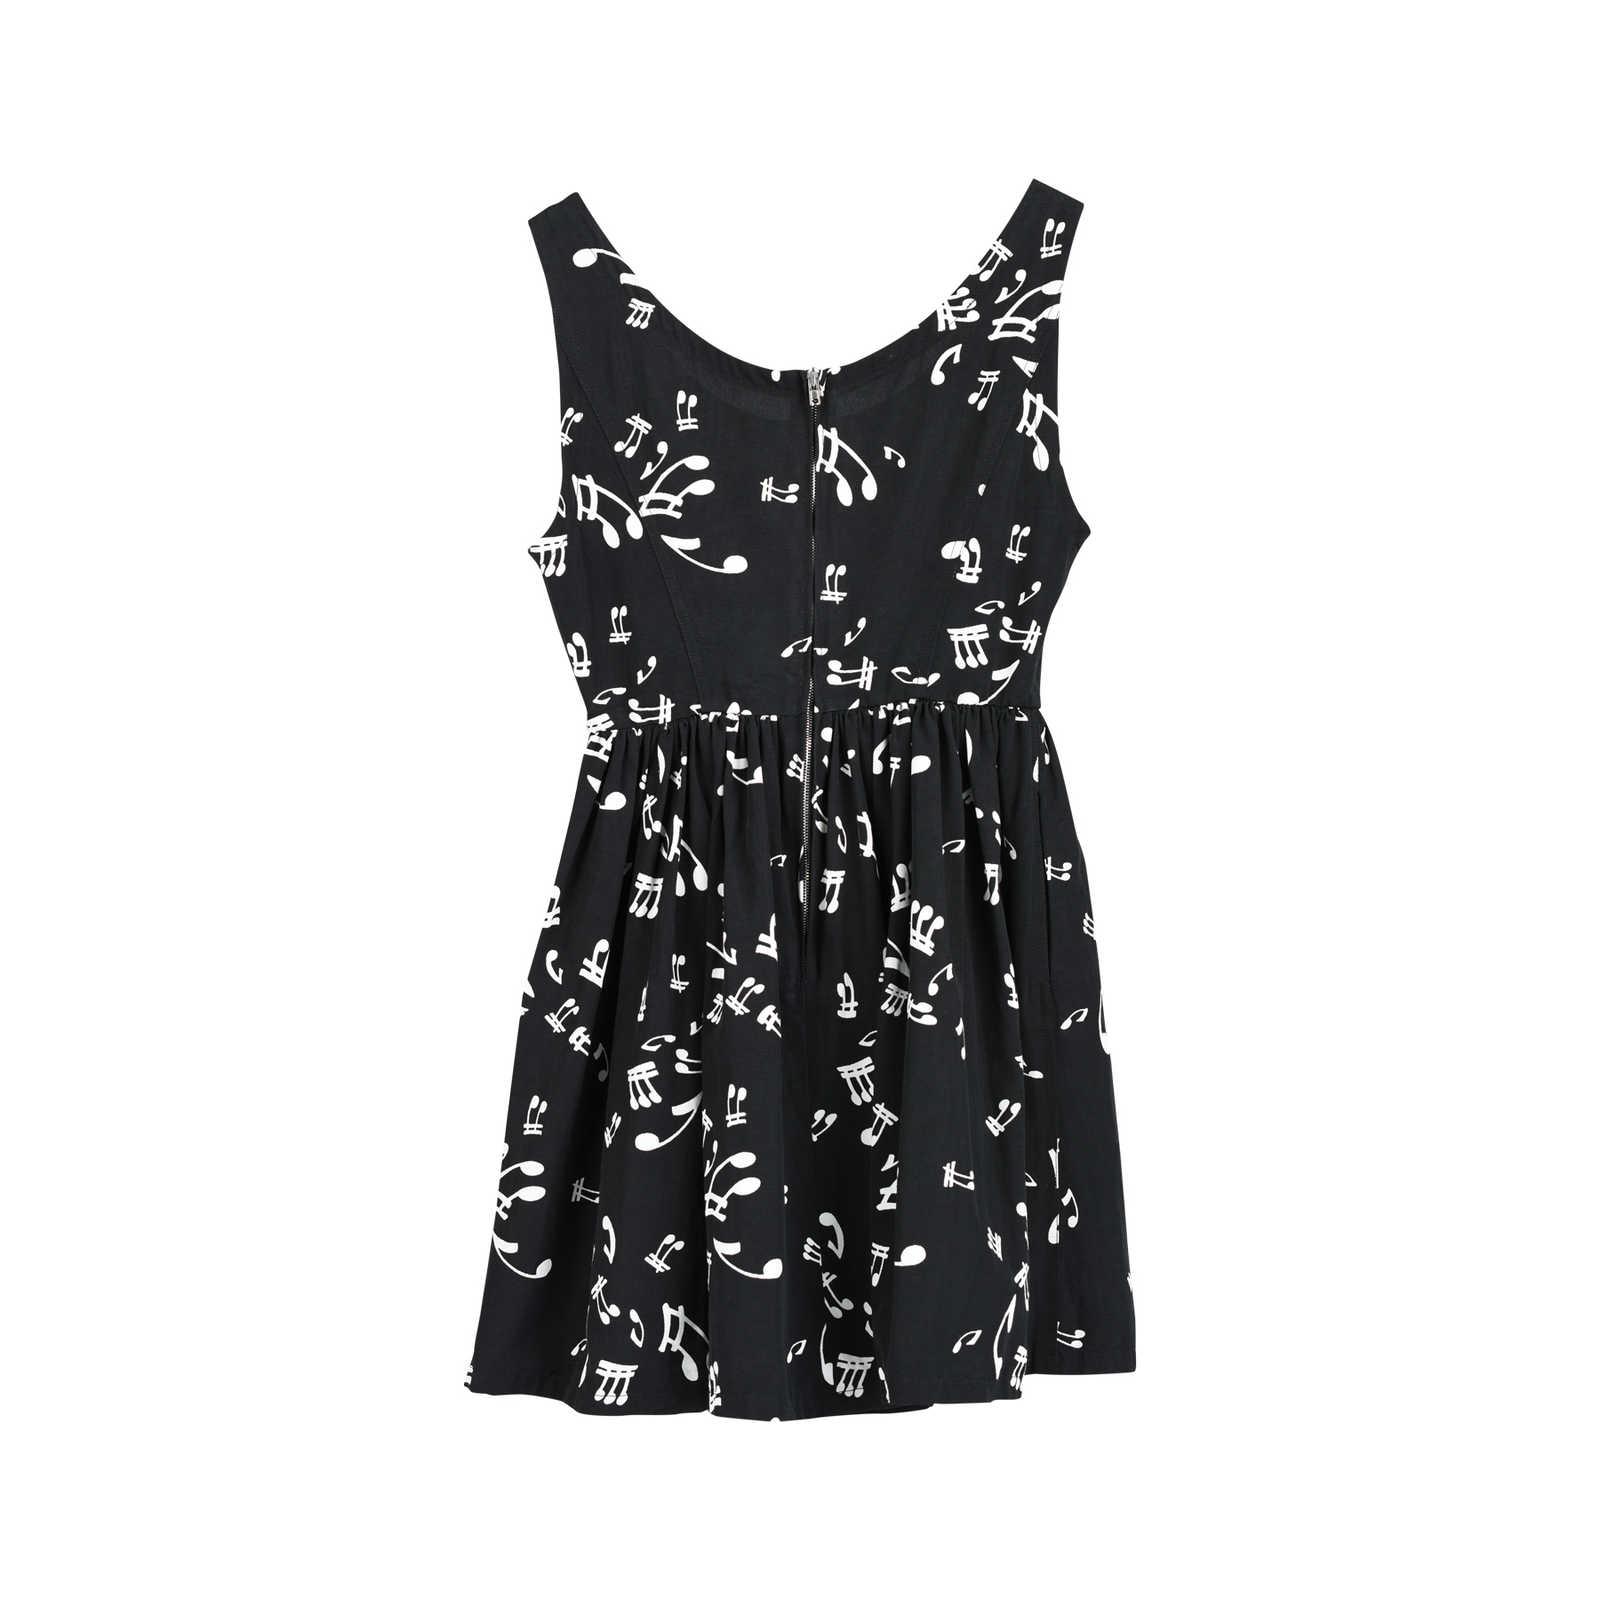 40a0a8f07776a ... Authentic Second Hand Miu Miu Silk Faille Music Notes Dress  (PSS-235-00136 ...